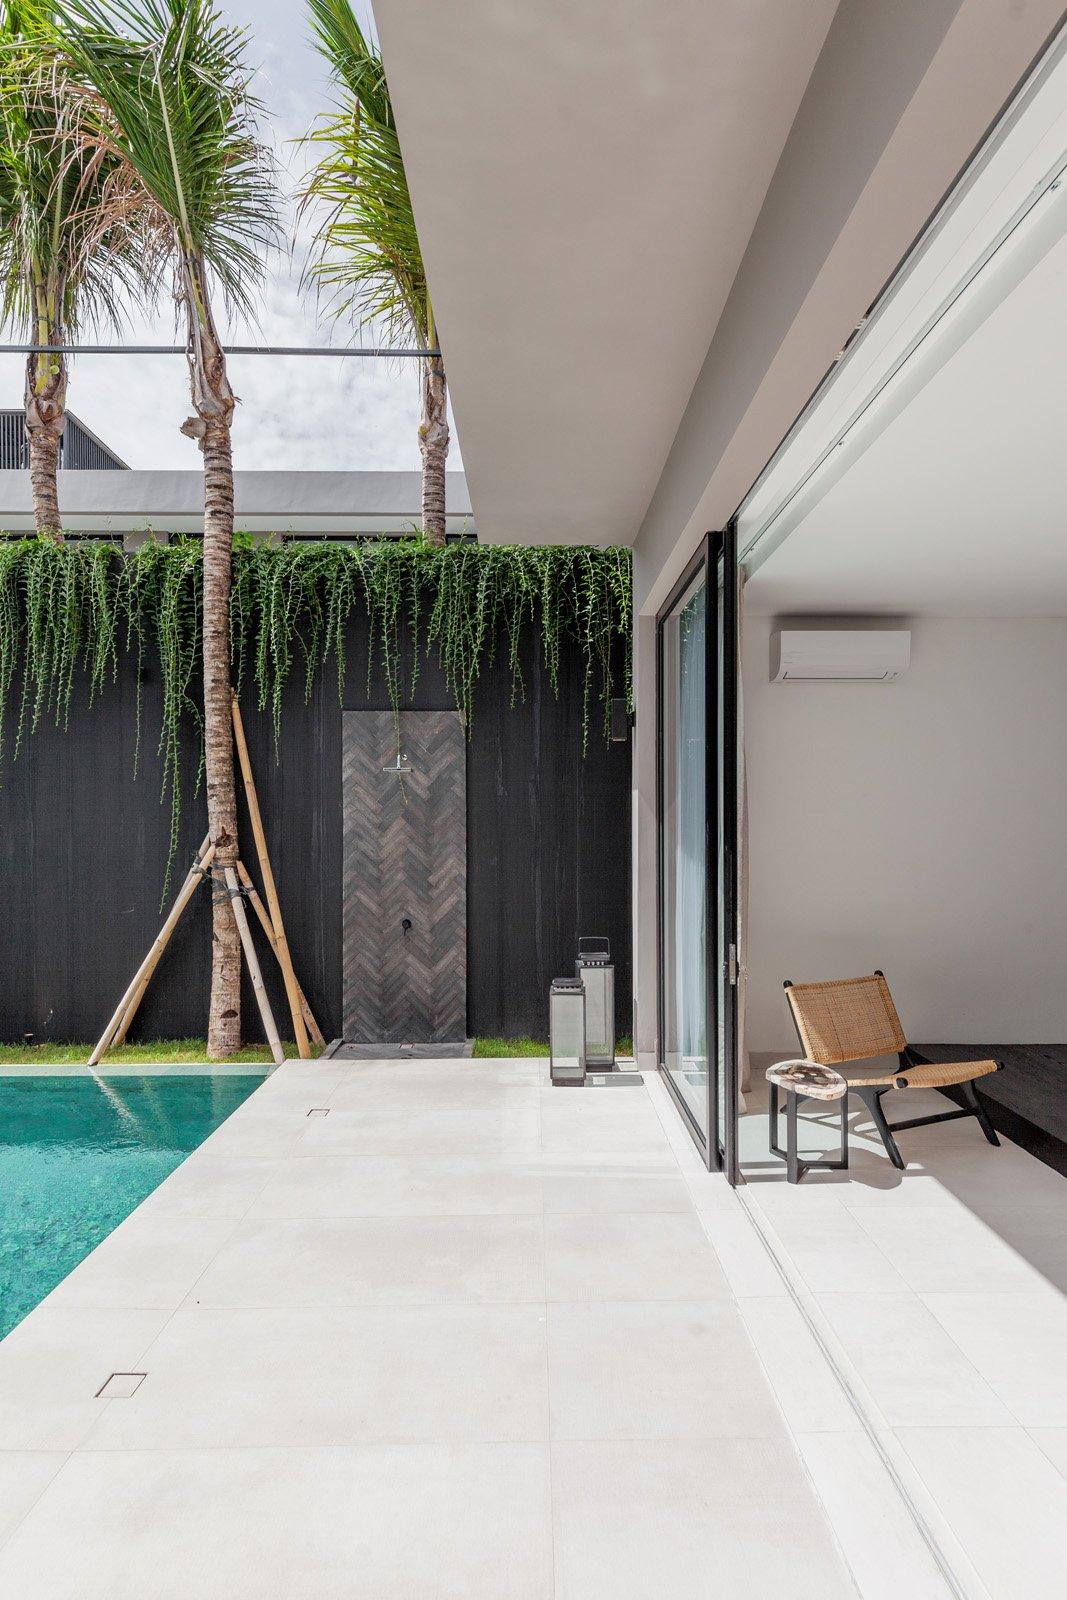 villa Aiko- Bali Interiors- house for sale, on the market